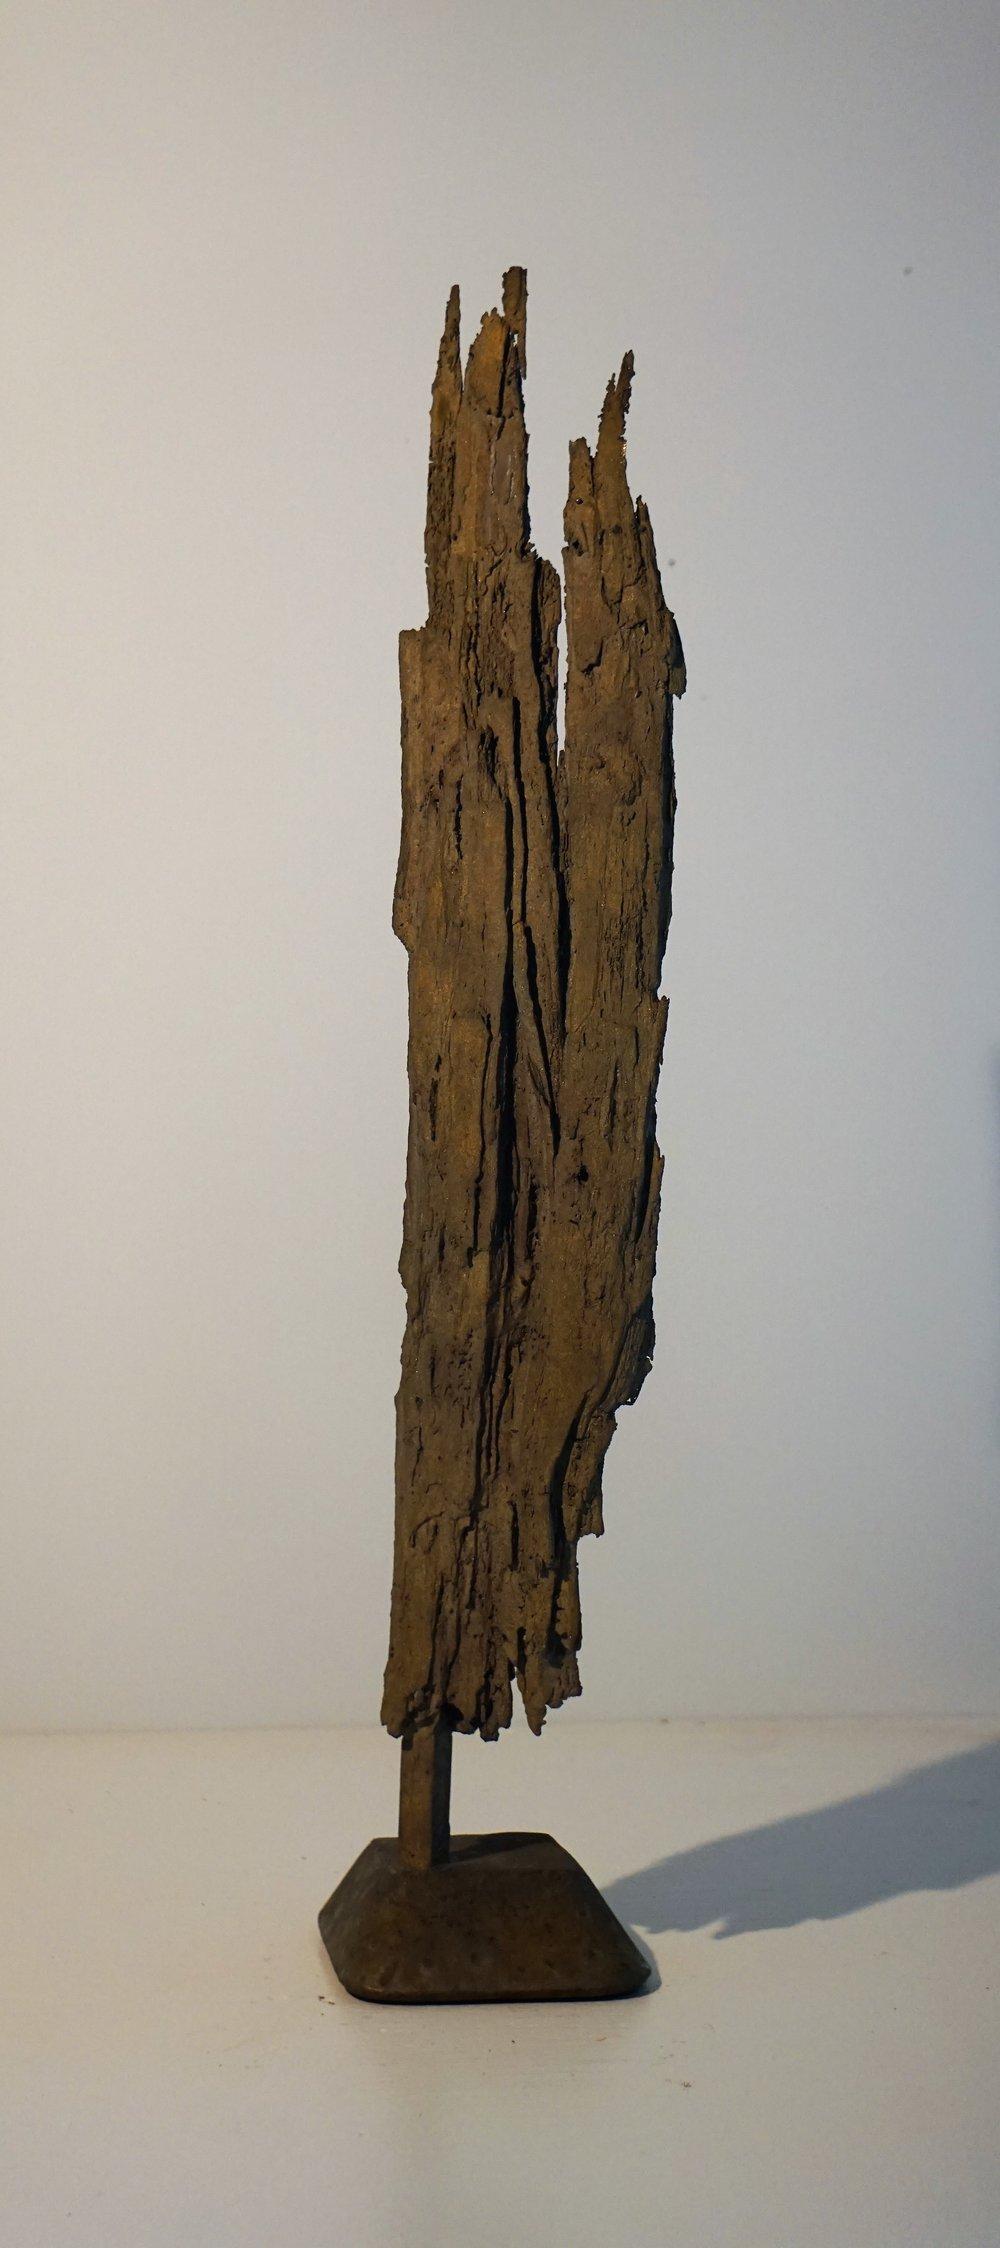 Bark #12